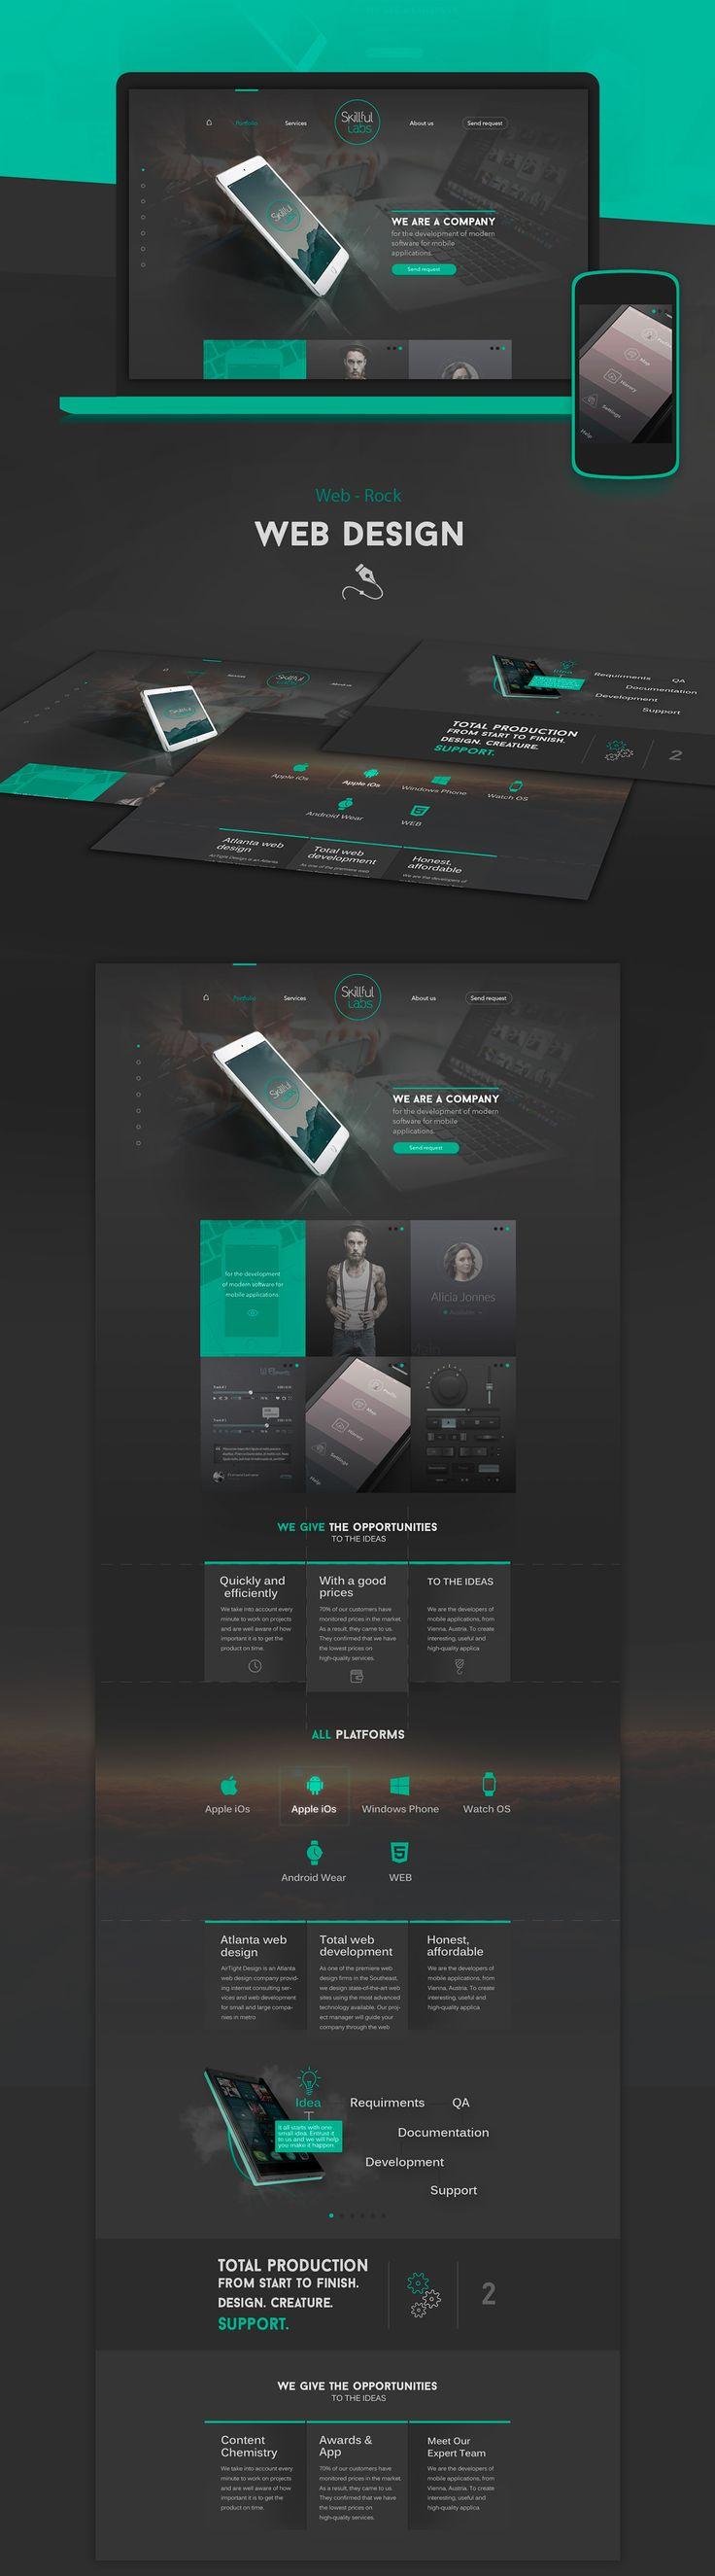 web design, website creation on Behance